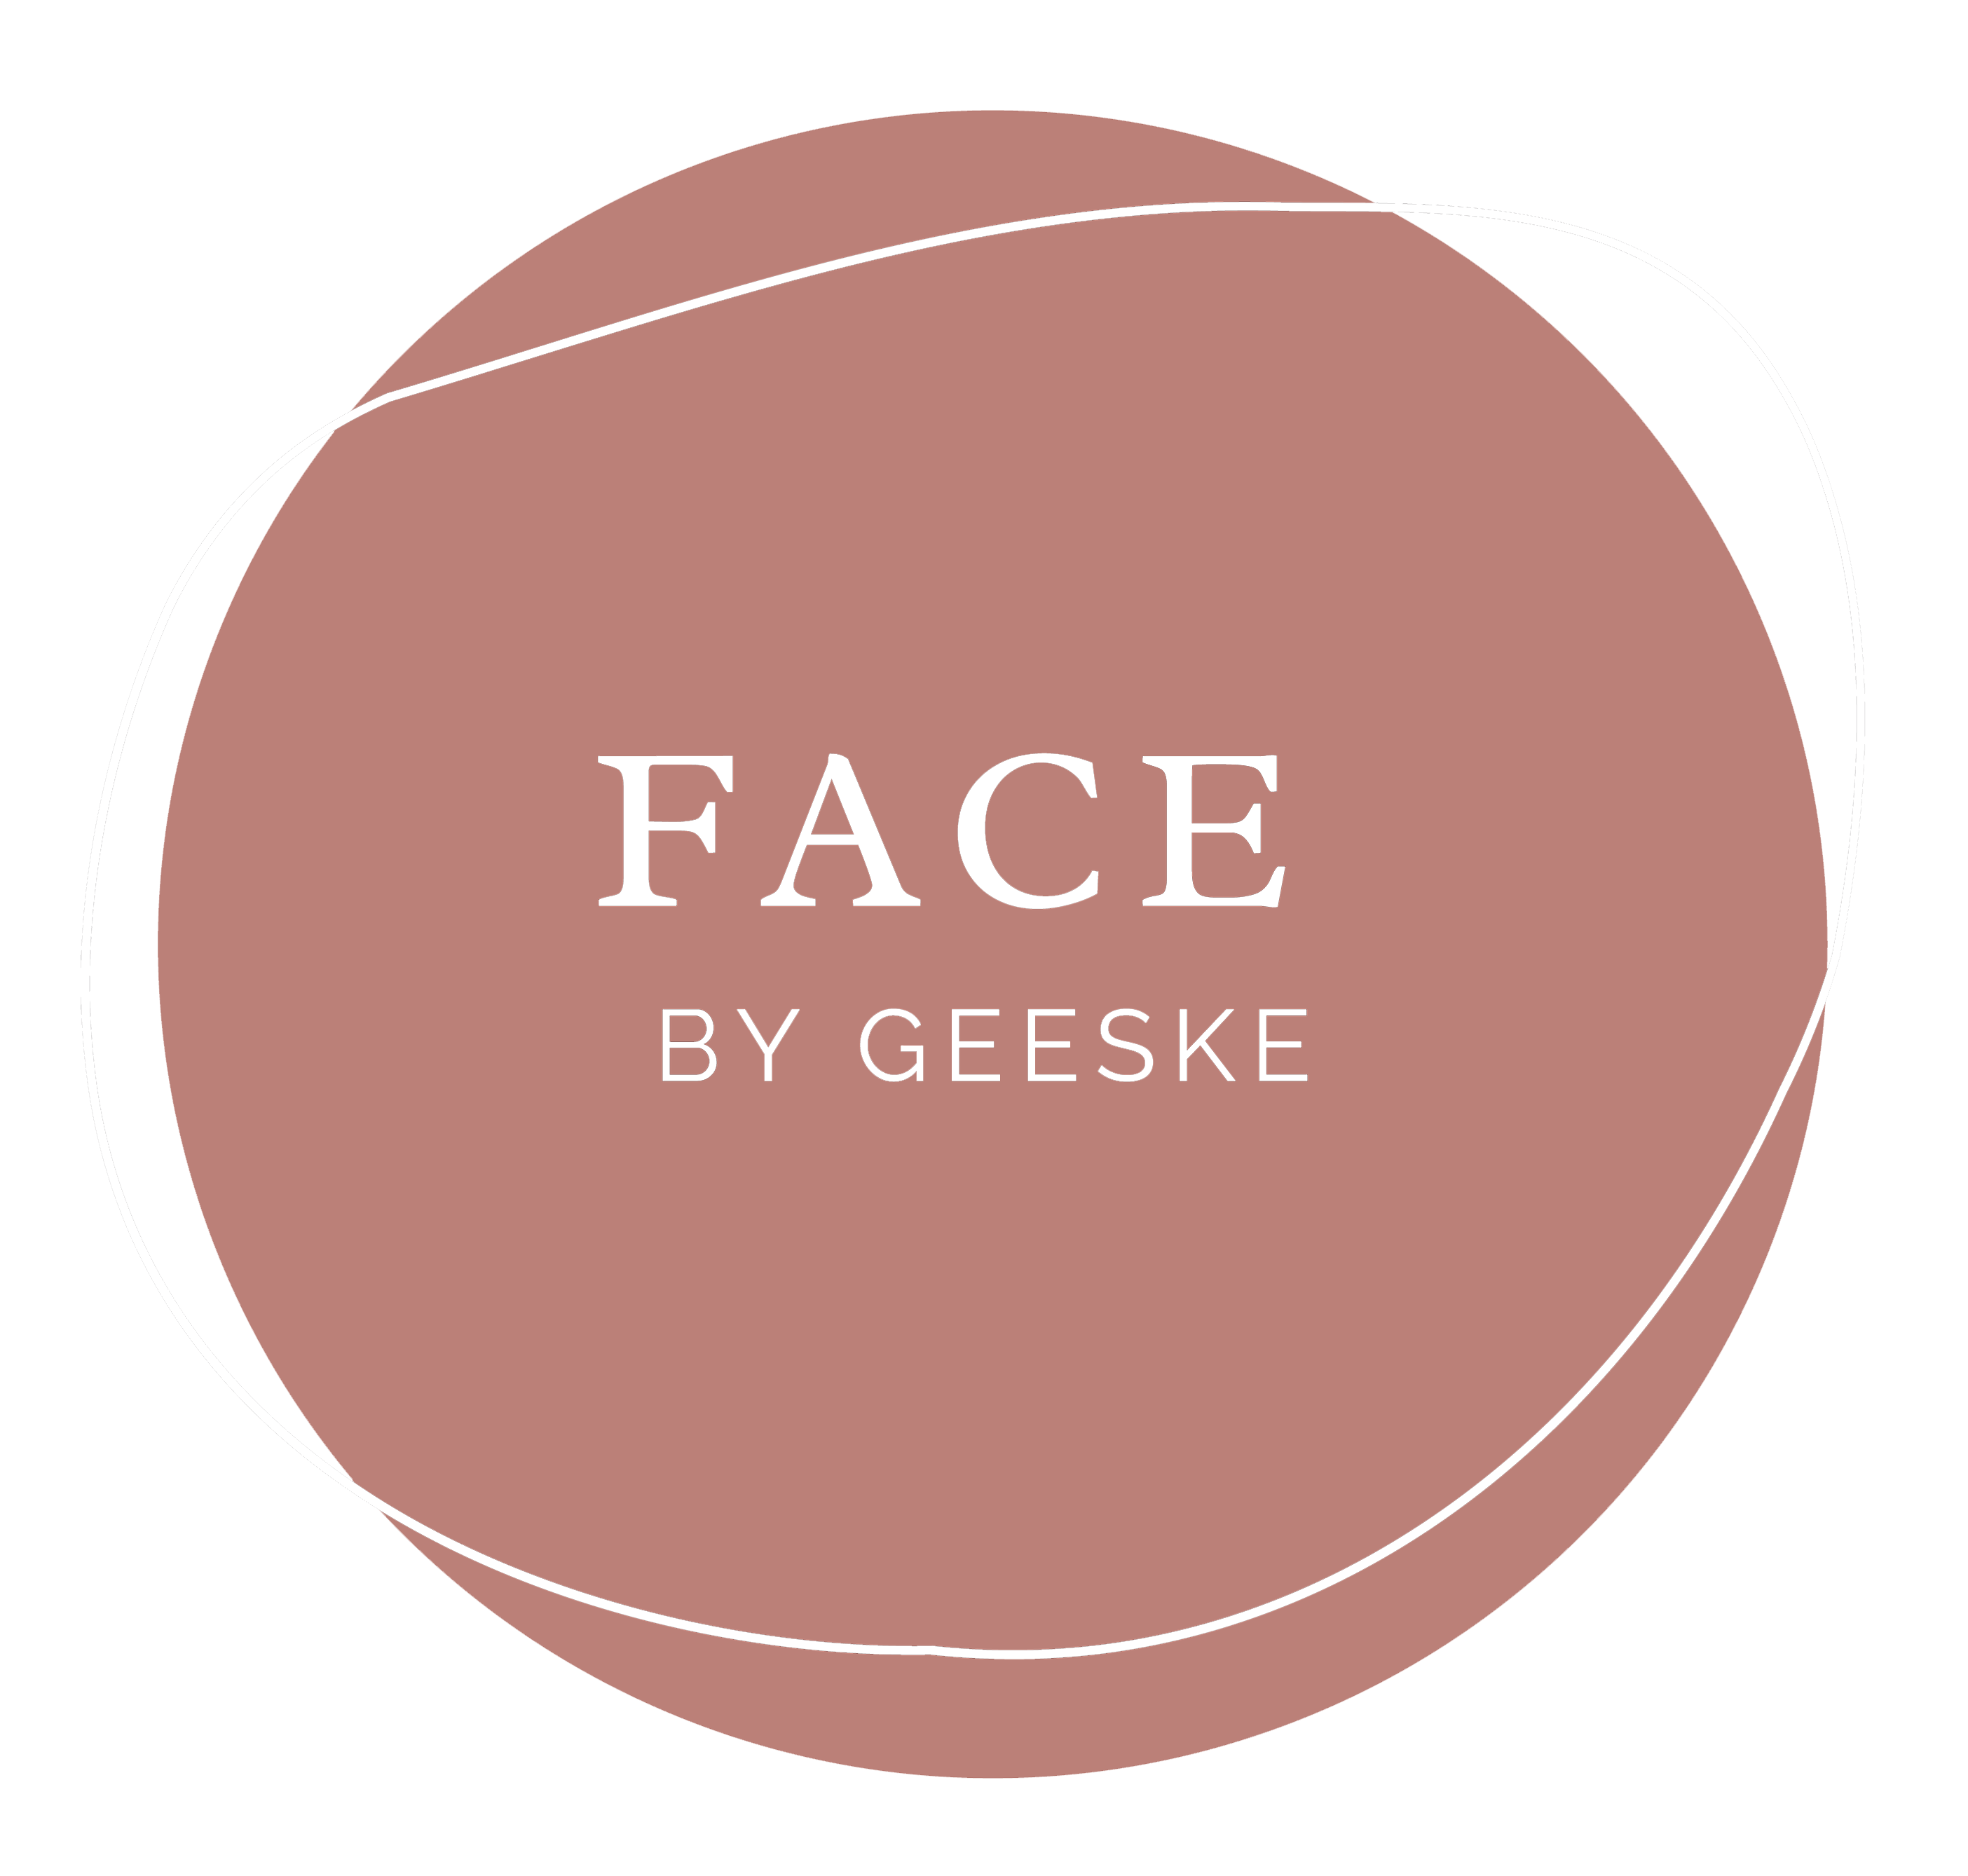 Face by Geeske